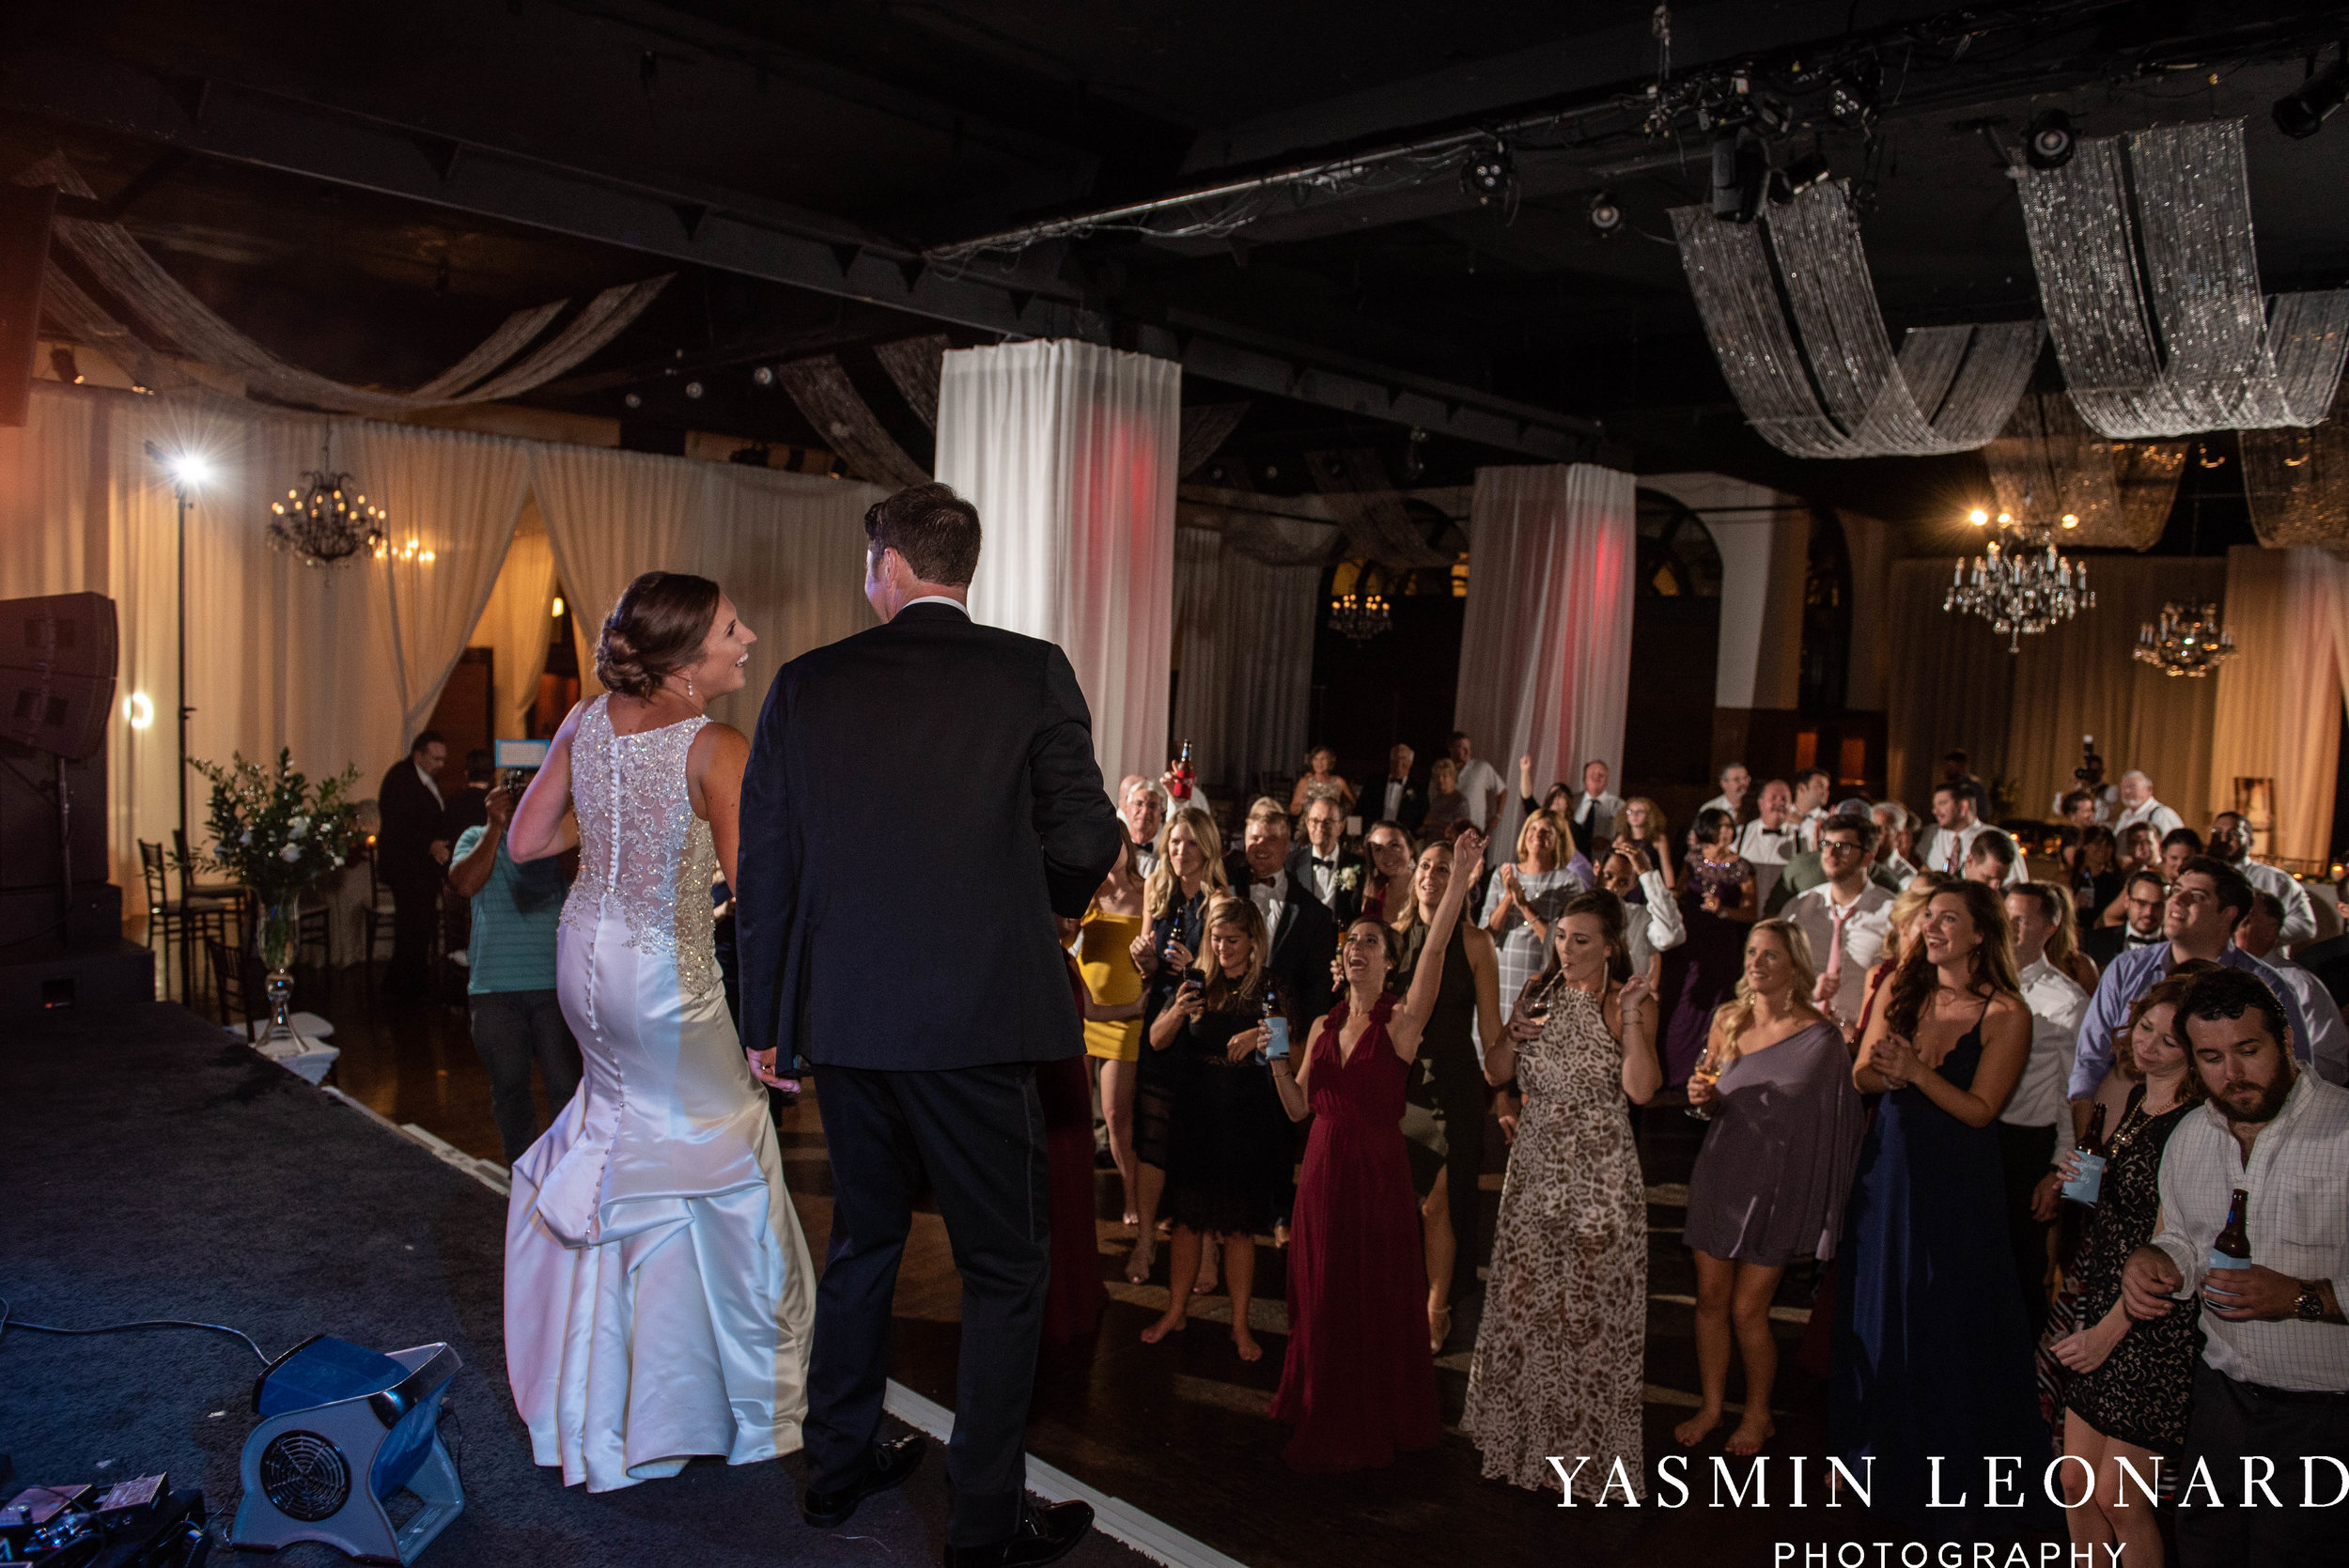 Millennium Center Wedding - Downtown Winston Salem - Winston Salem Wedding Photographer - Winston Salem Venues - Indoor Wedding Venues - NC Wedding Photographer - Yasmin Leonard Photography-82.jpg